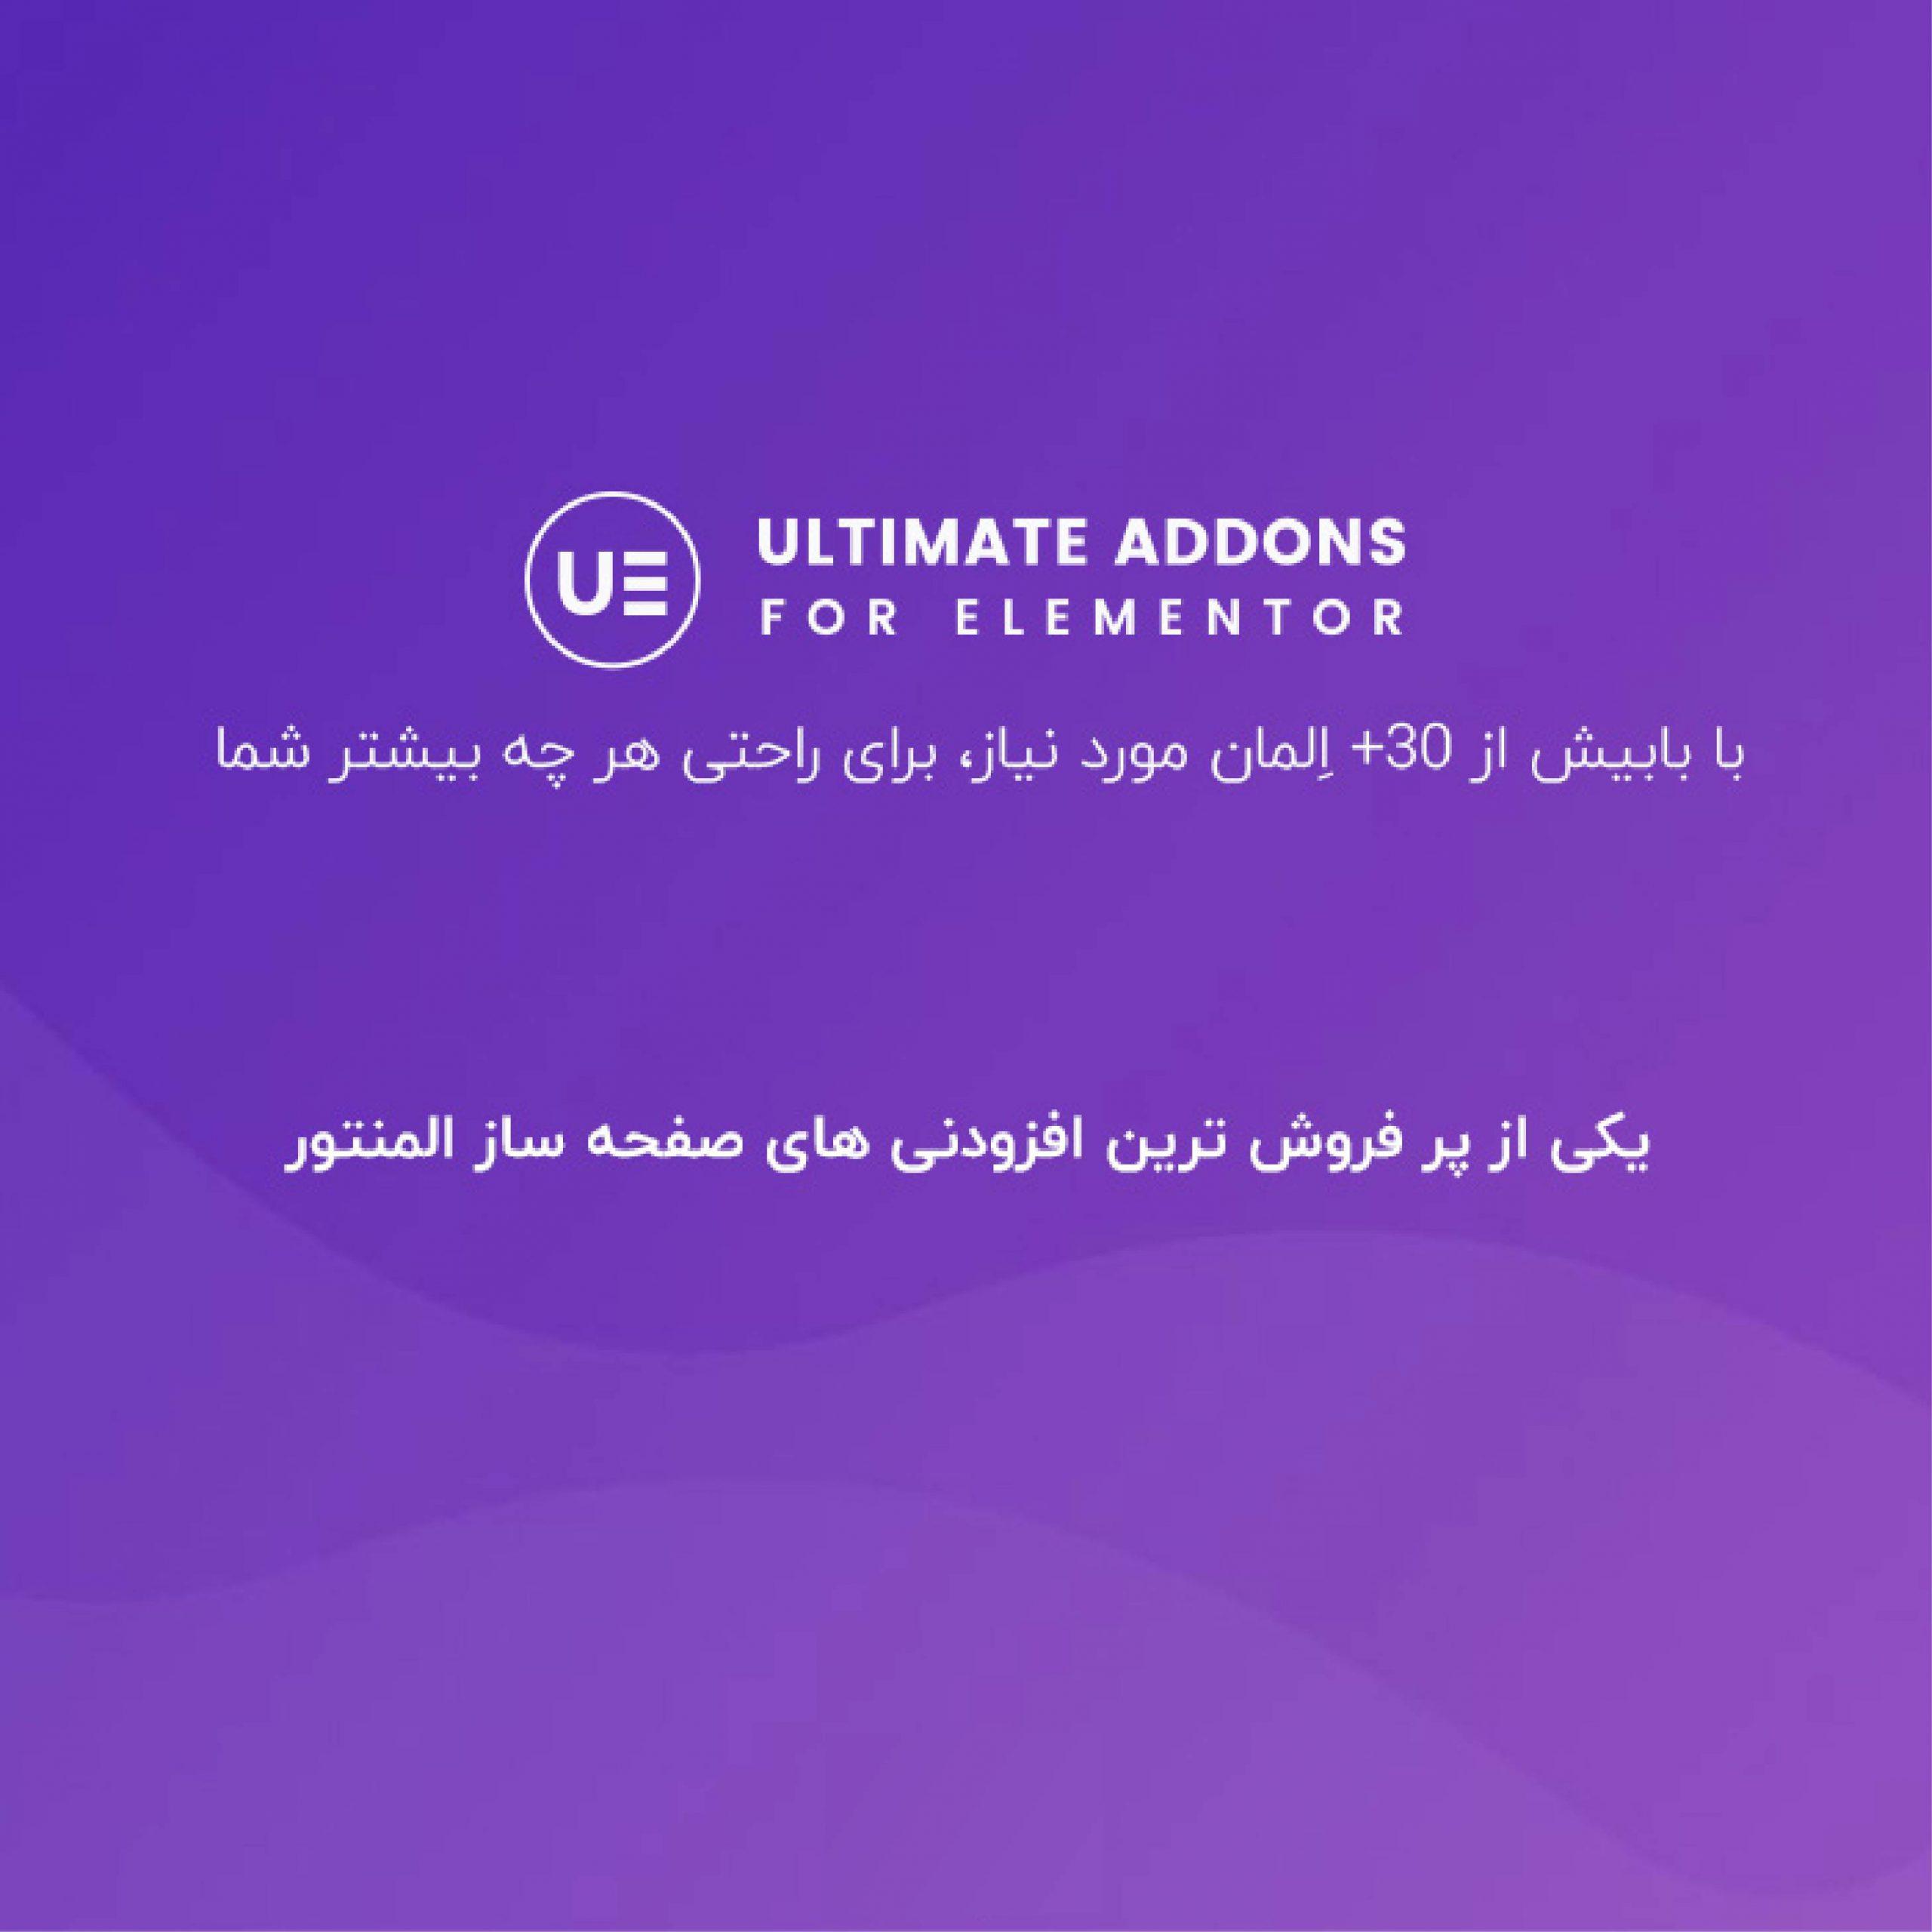 افزونه Ultimate Addons المنتور - آقای برنامه نویس